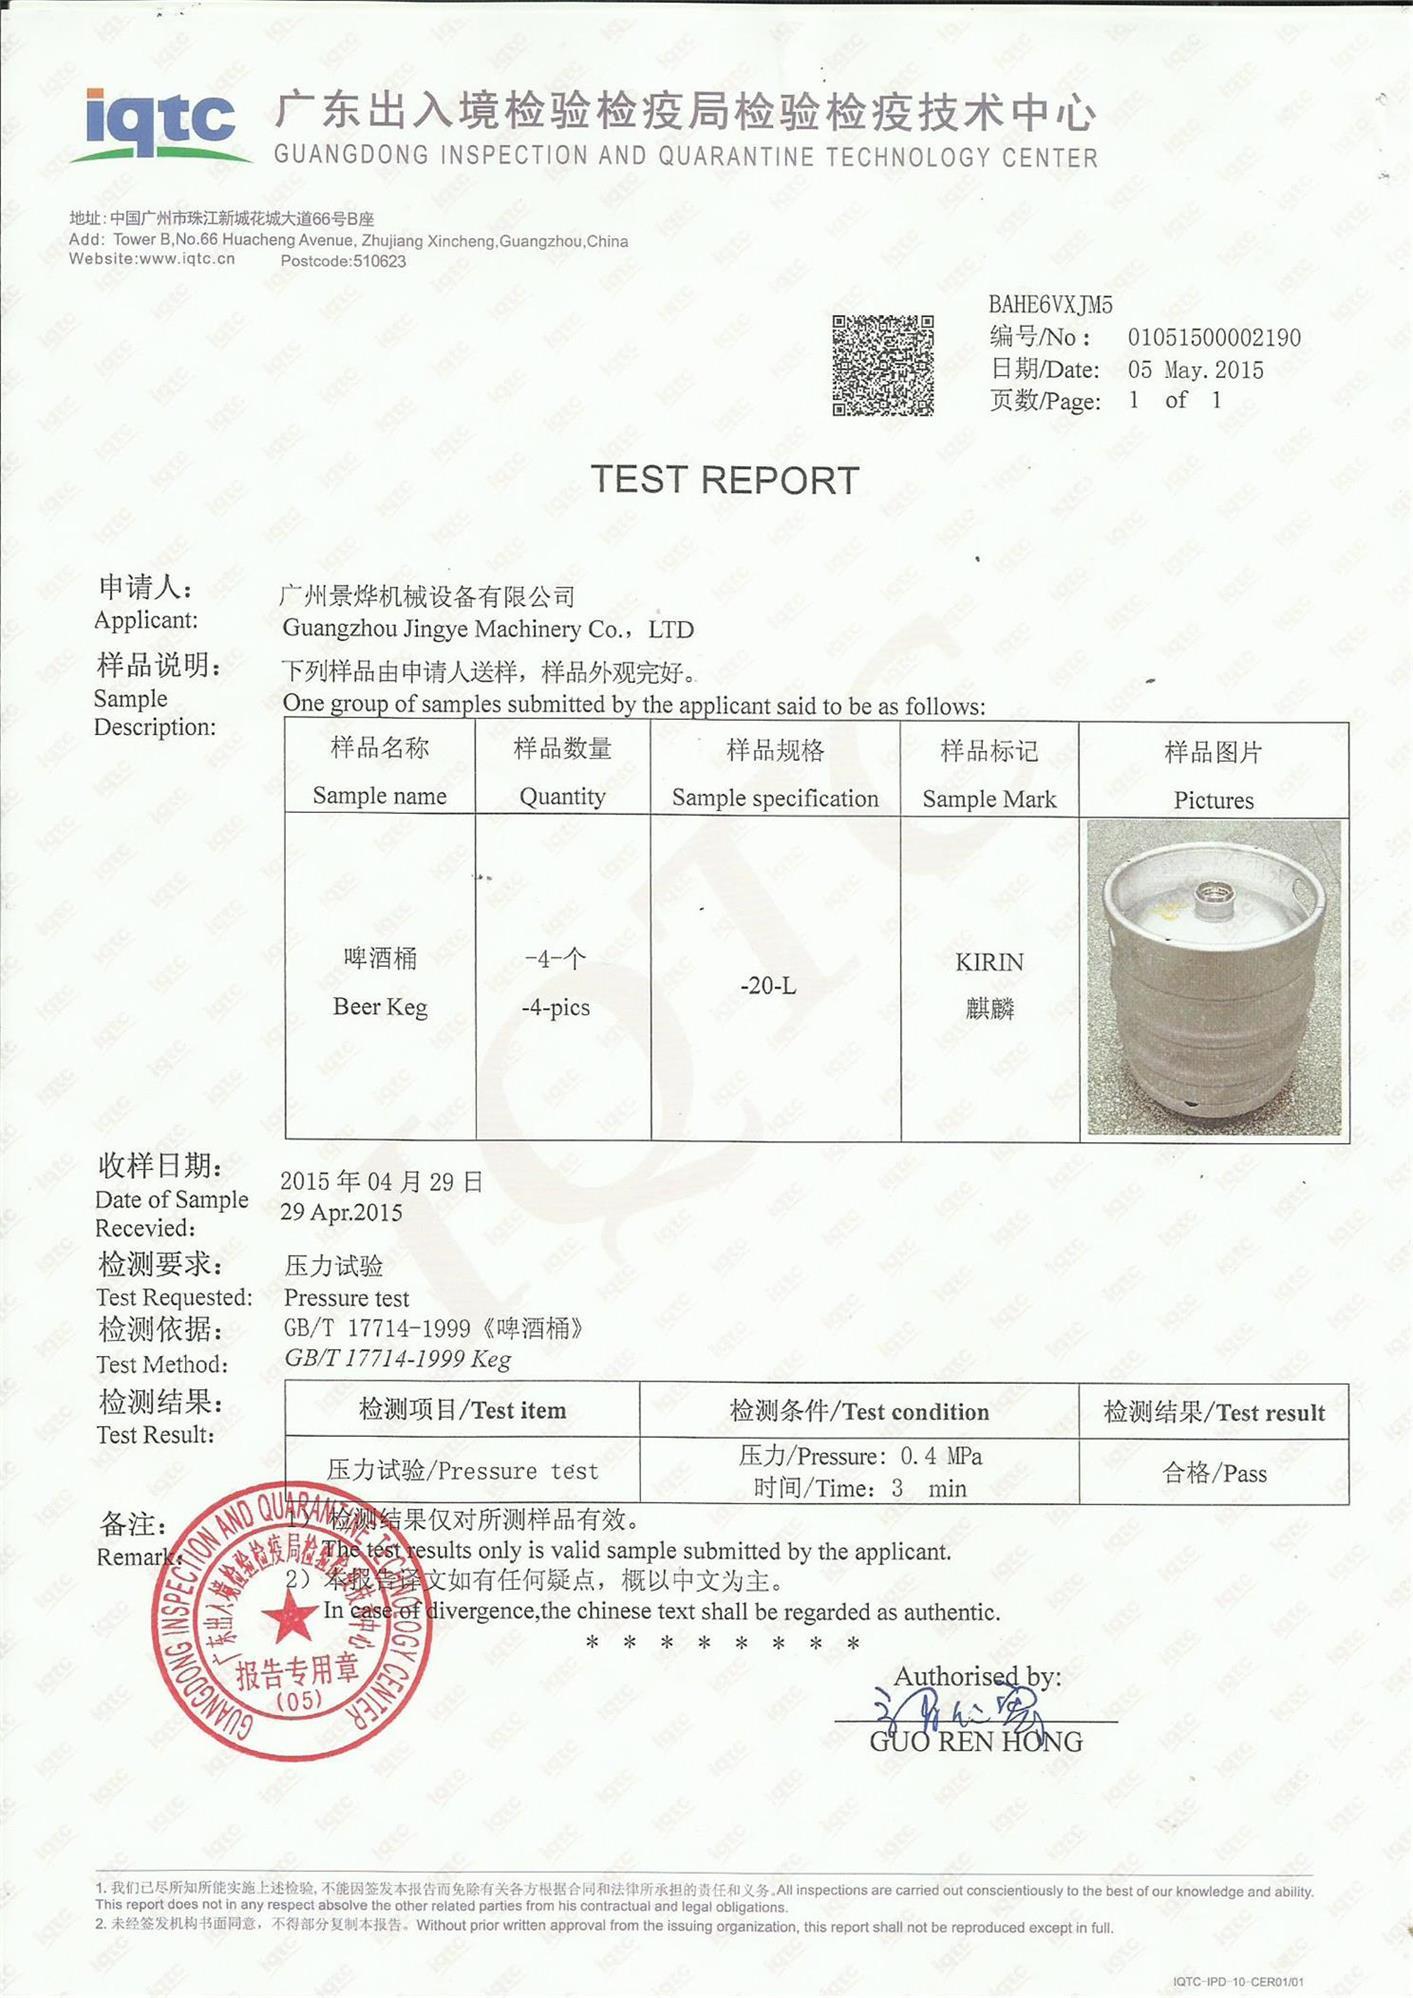 20L certificates